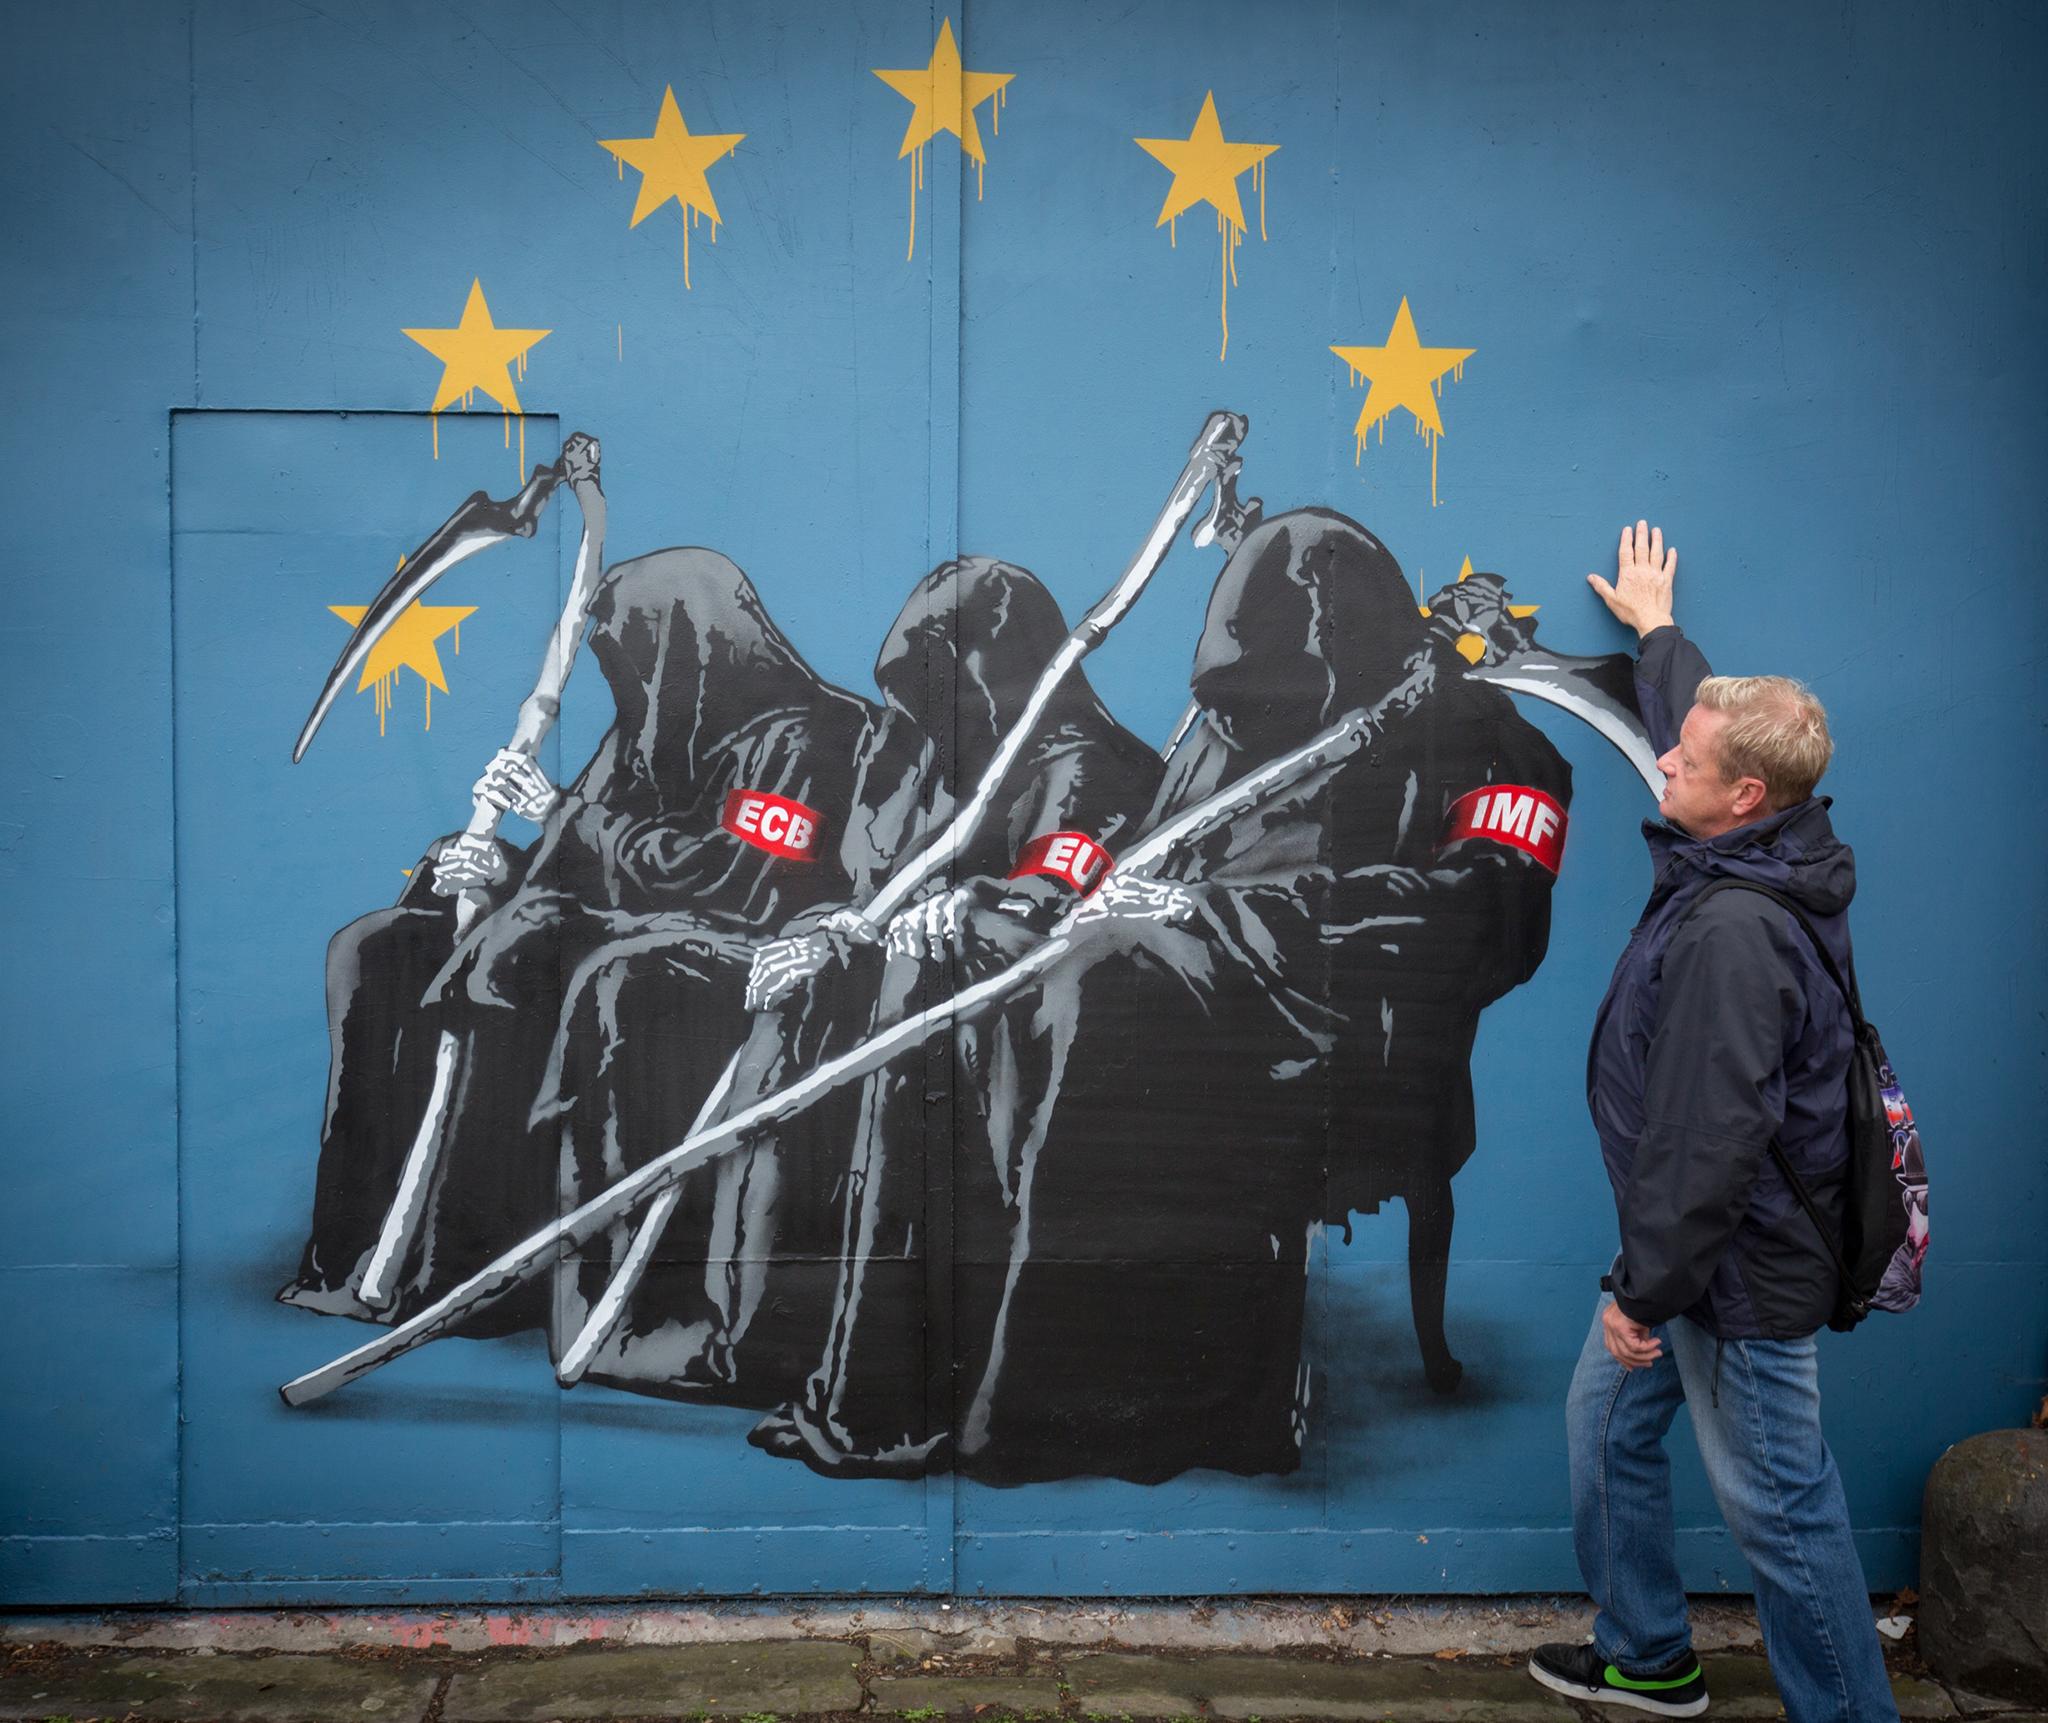 Bristol Hosts Europe's Largest Street Art And Graffiti Festival